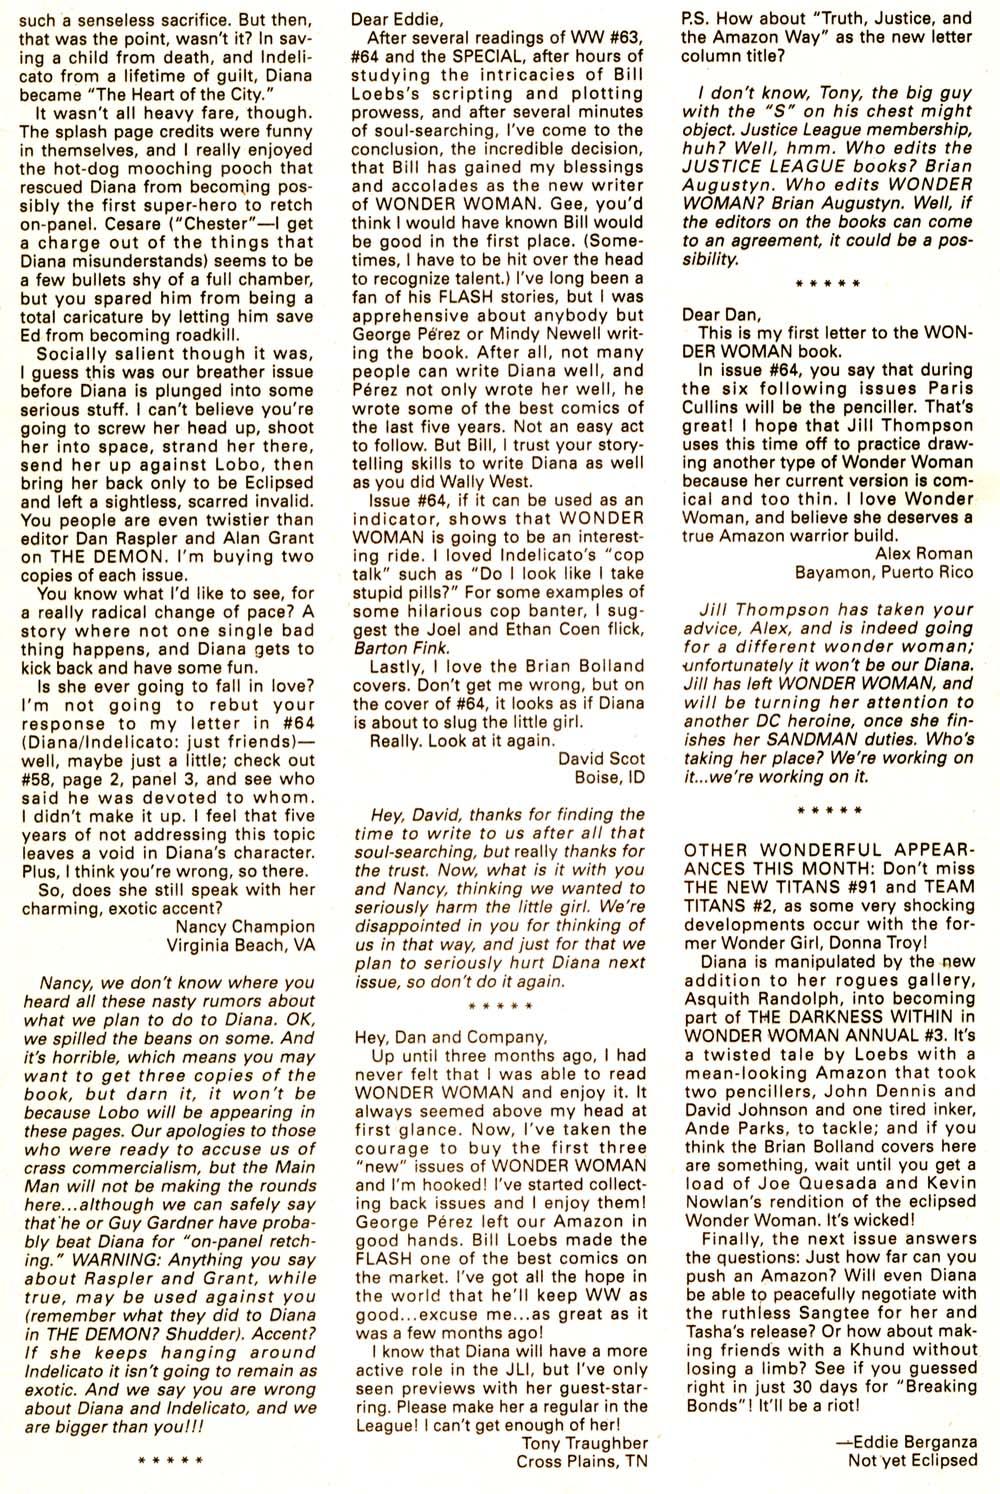 Read online Wonder Woman (1987) comic -  Issue #67 - 25